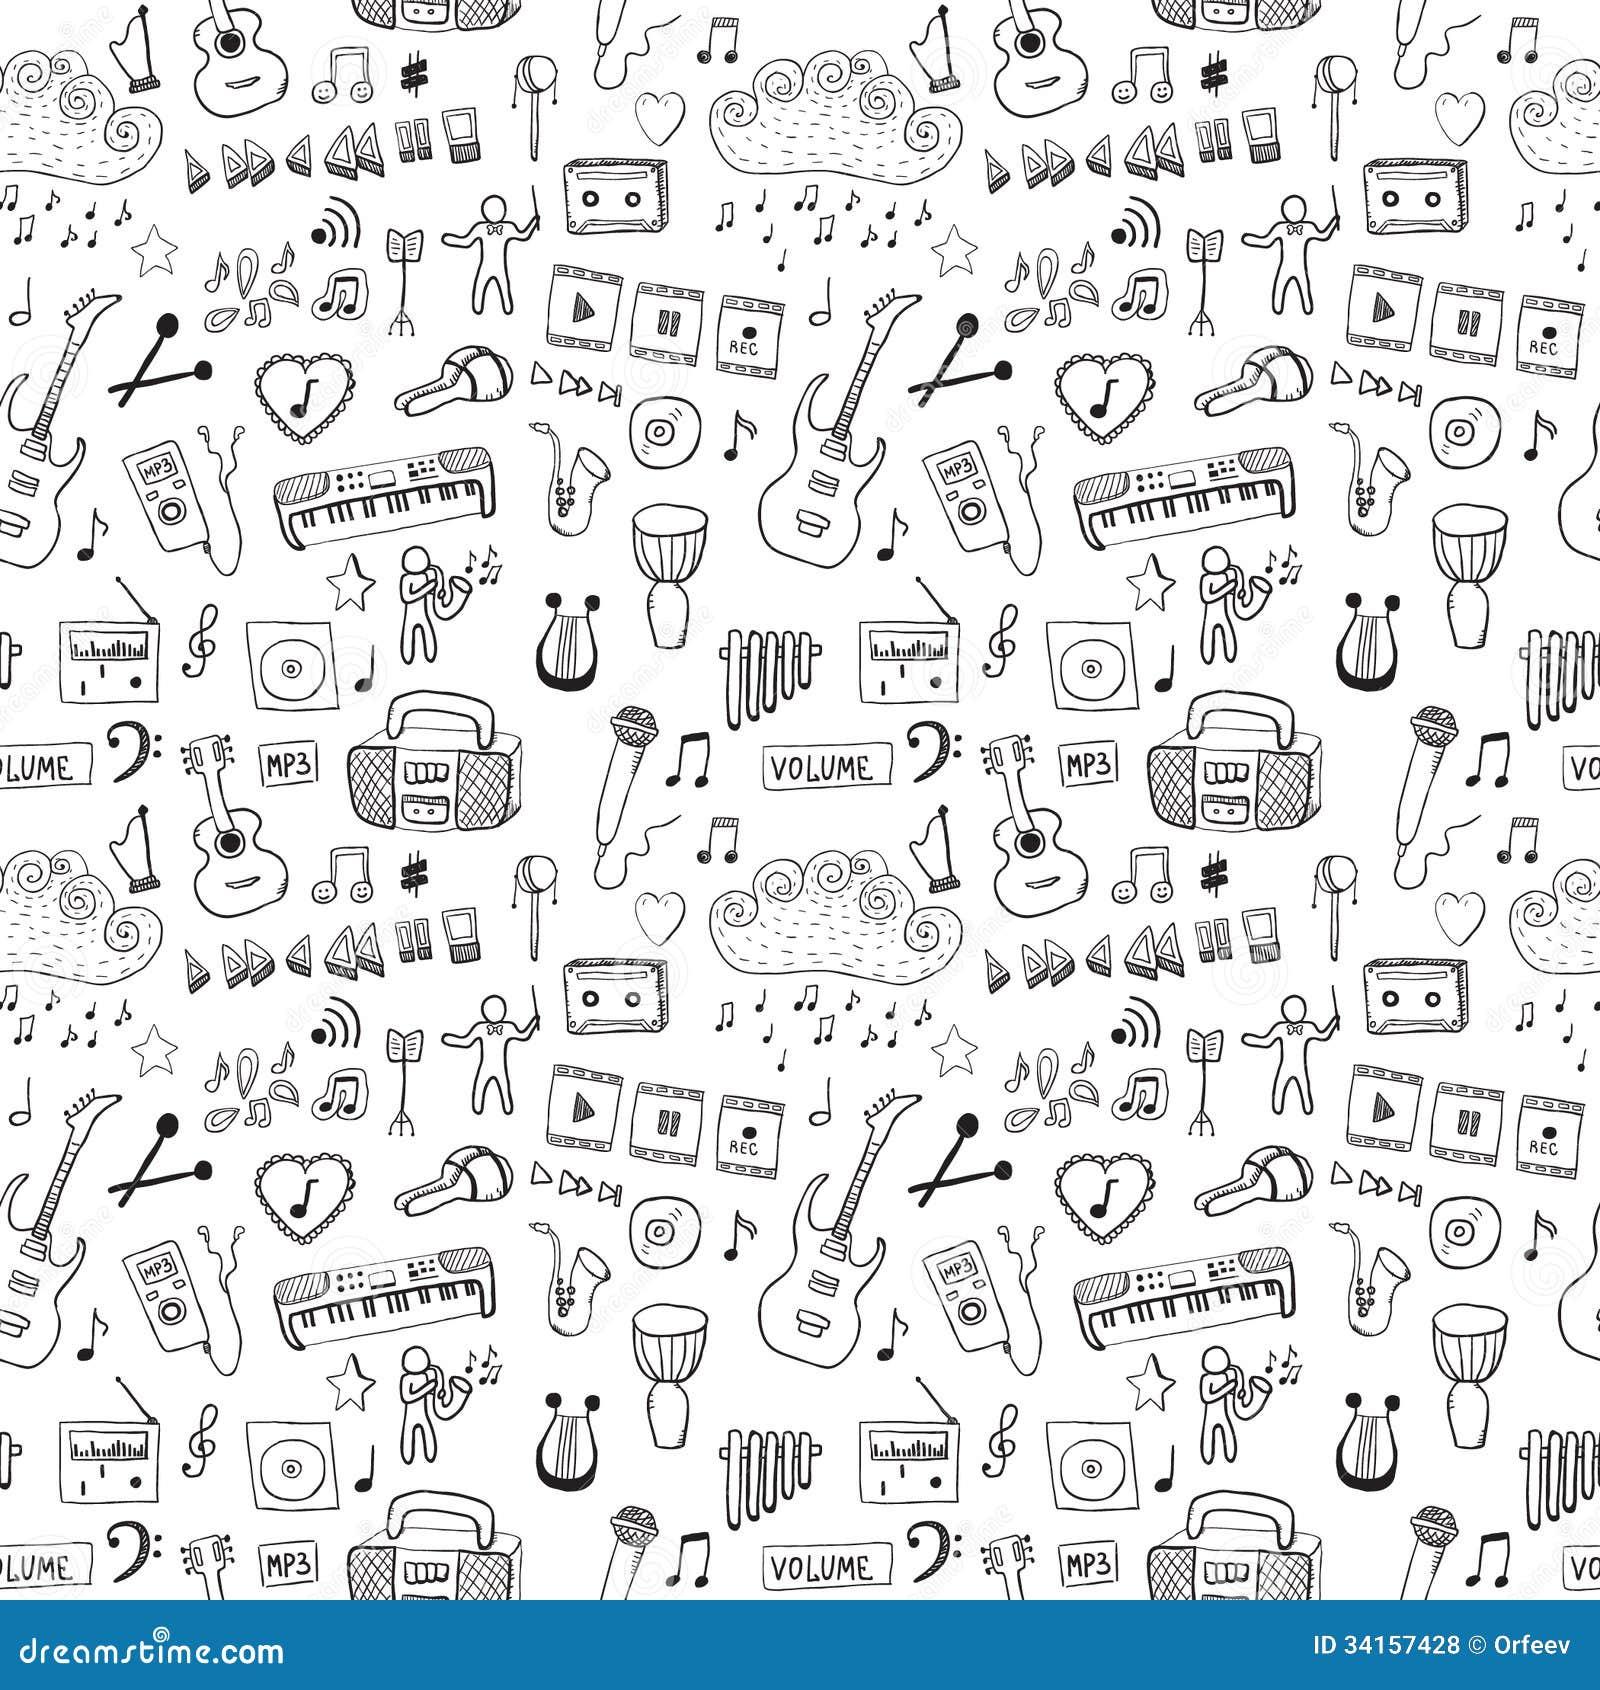 Music symbols stock vector illustration of guitar artistic music symbols royalty free stock photo buycottarizona